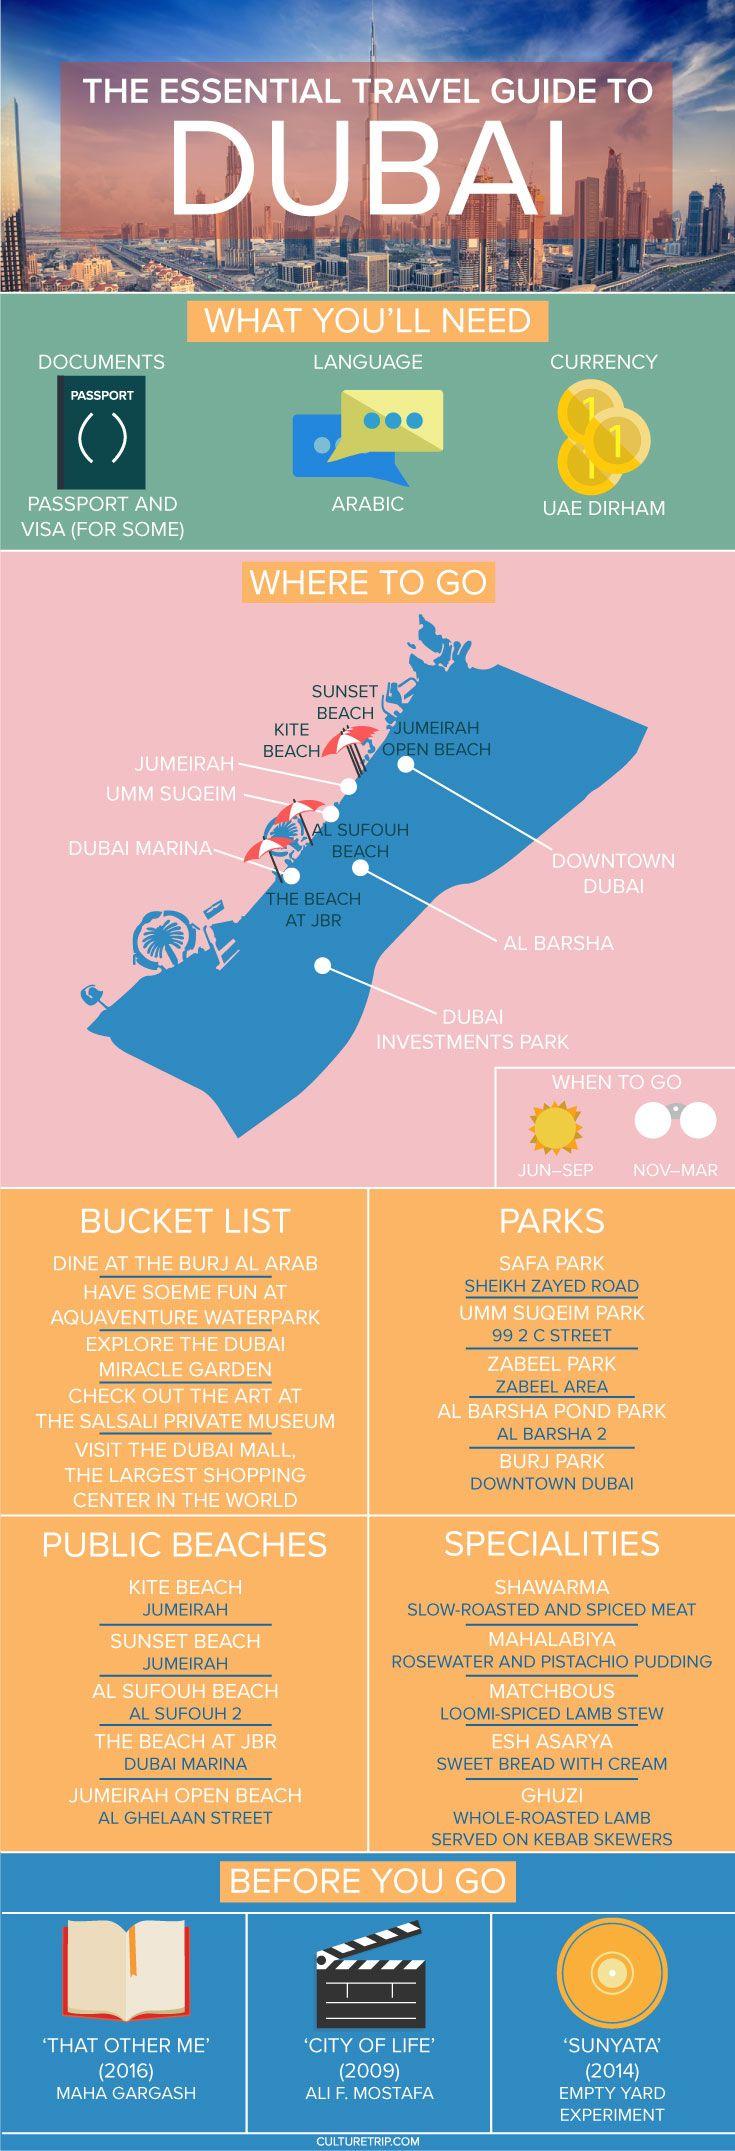 The Essential Travel Guide to Dubai (Infographic) Pinterest: theculturetrip